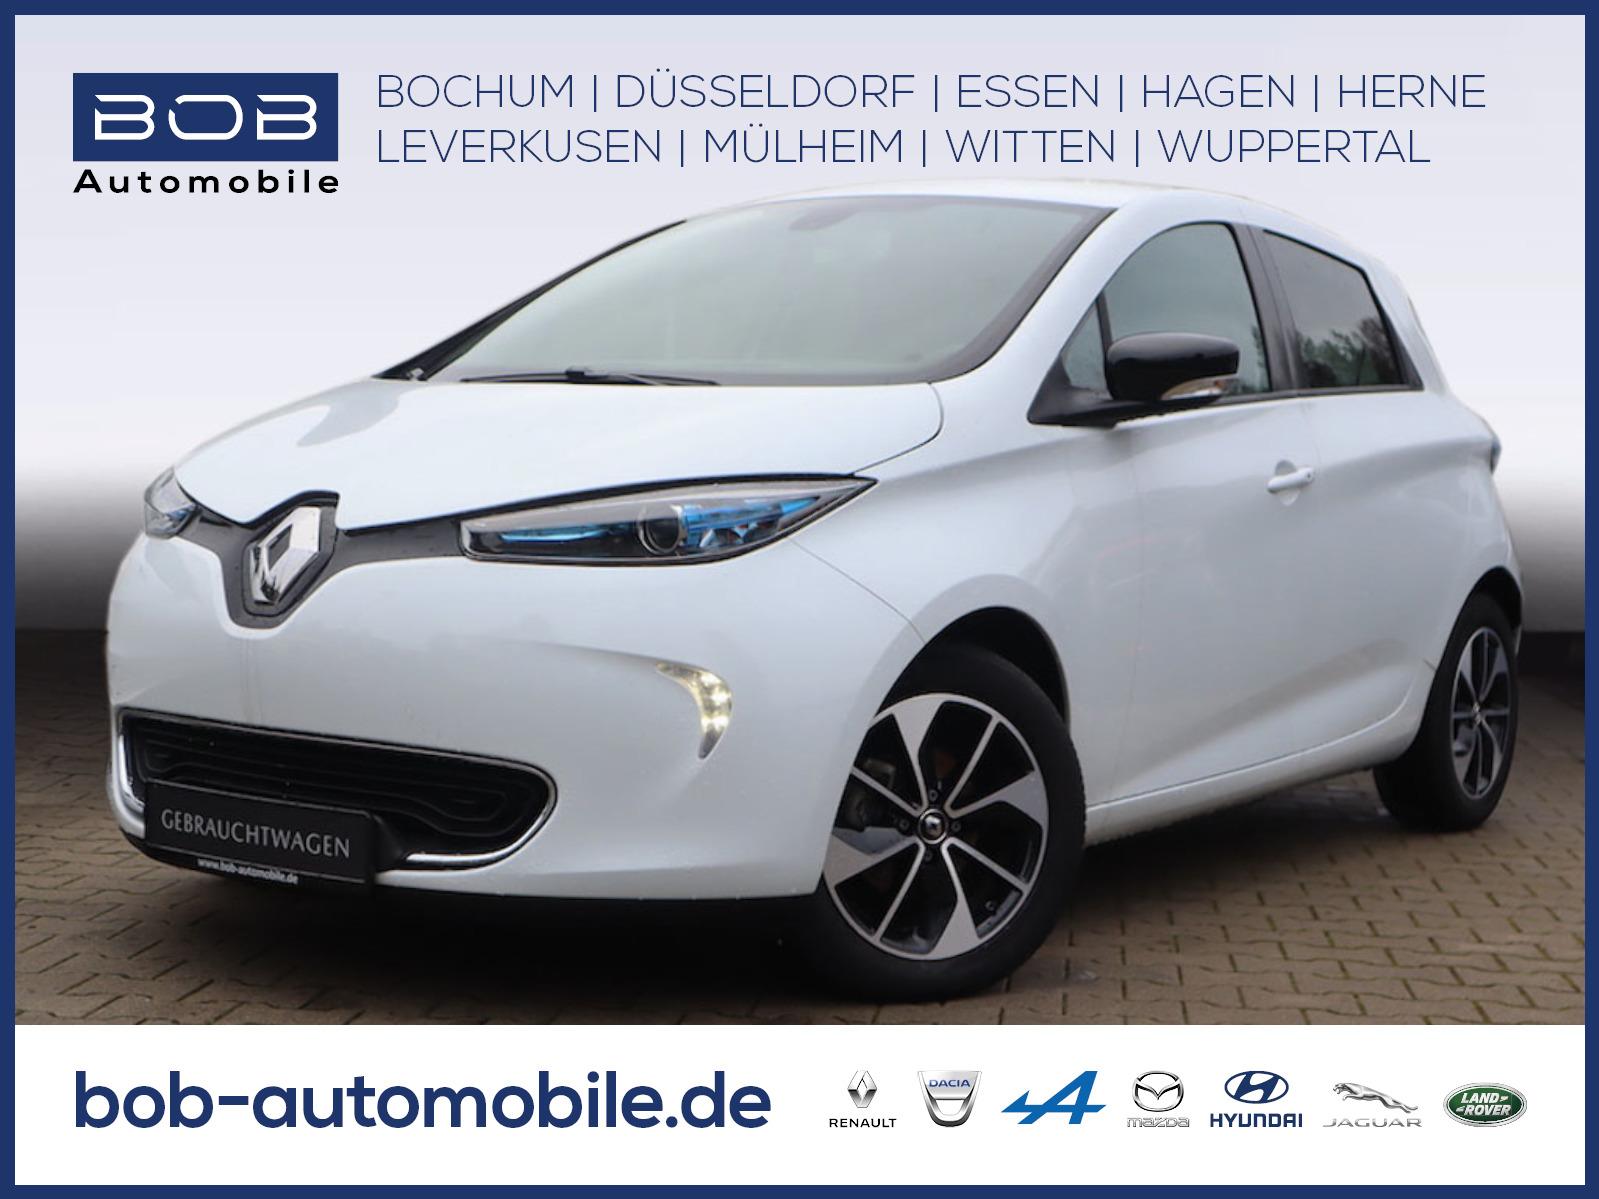 Renault ZOE 41kwh NAVI PDC, Jahr 2017, Elektro